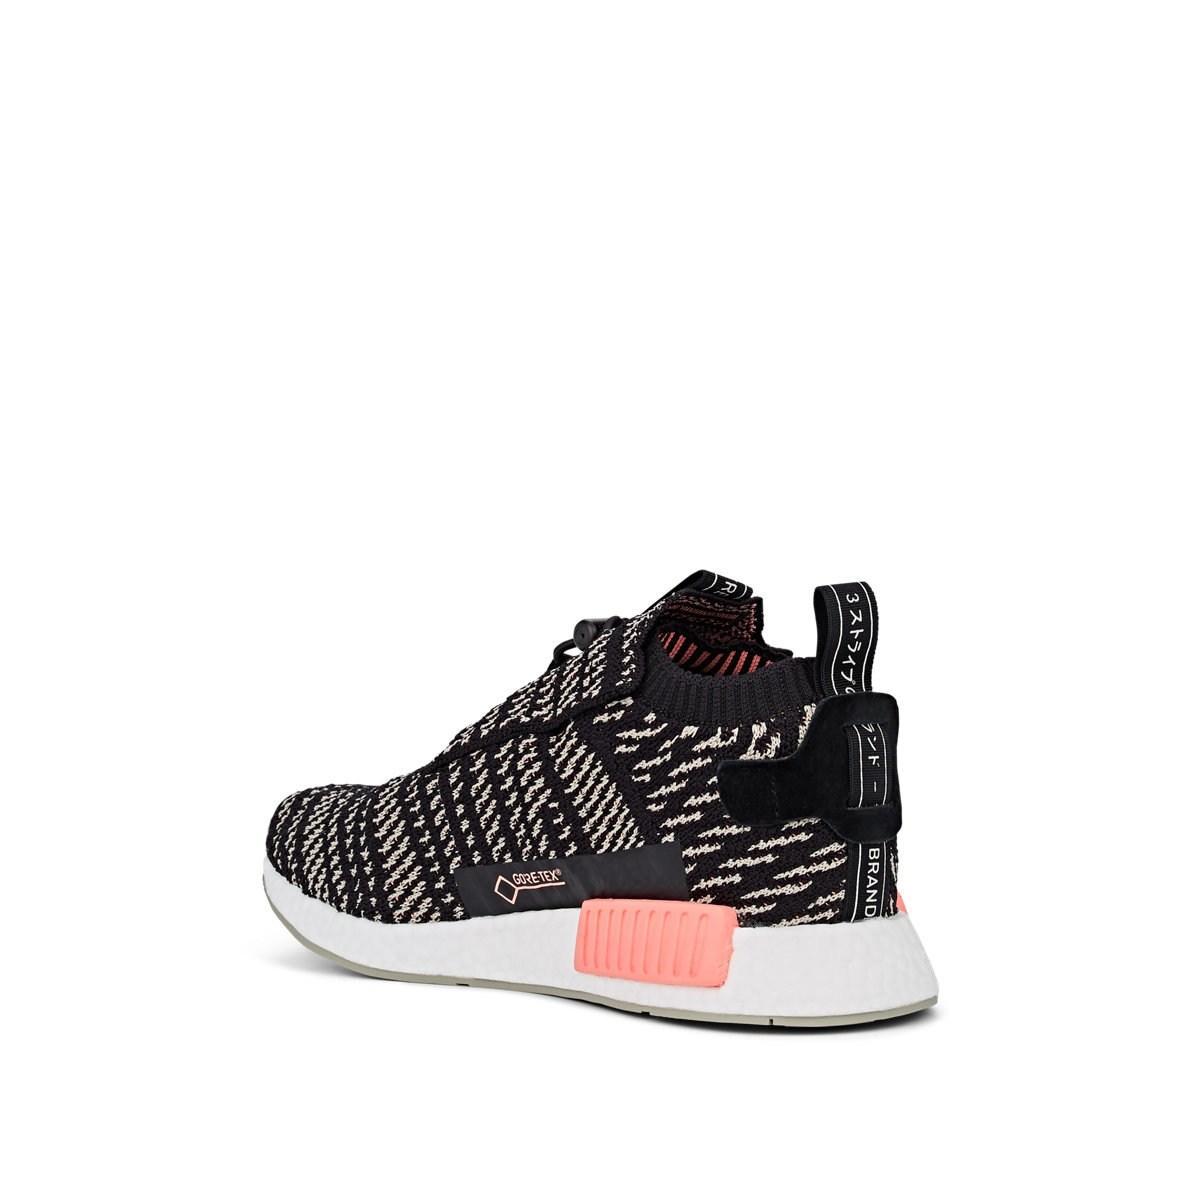 the latest 1e291 c2434 Adidas - Black Nmd Ts1 Pk Gtx Primeknit Sneakers for Men - Lyst. View  fullscreen